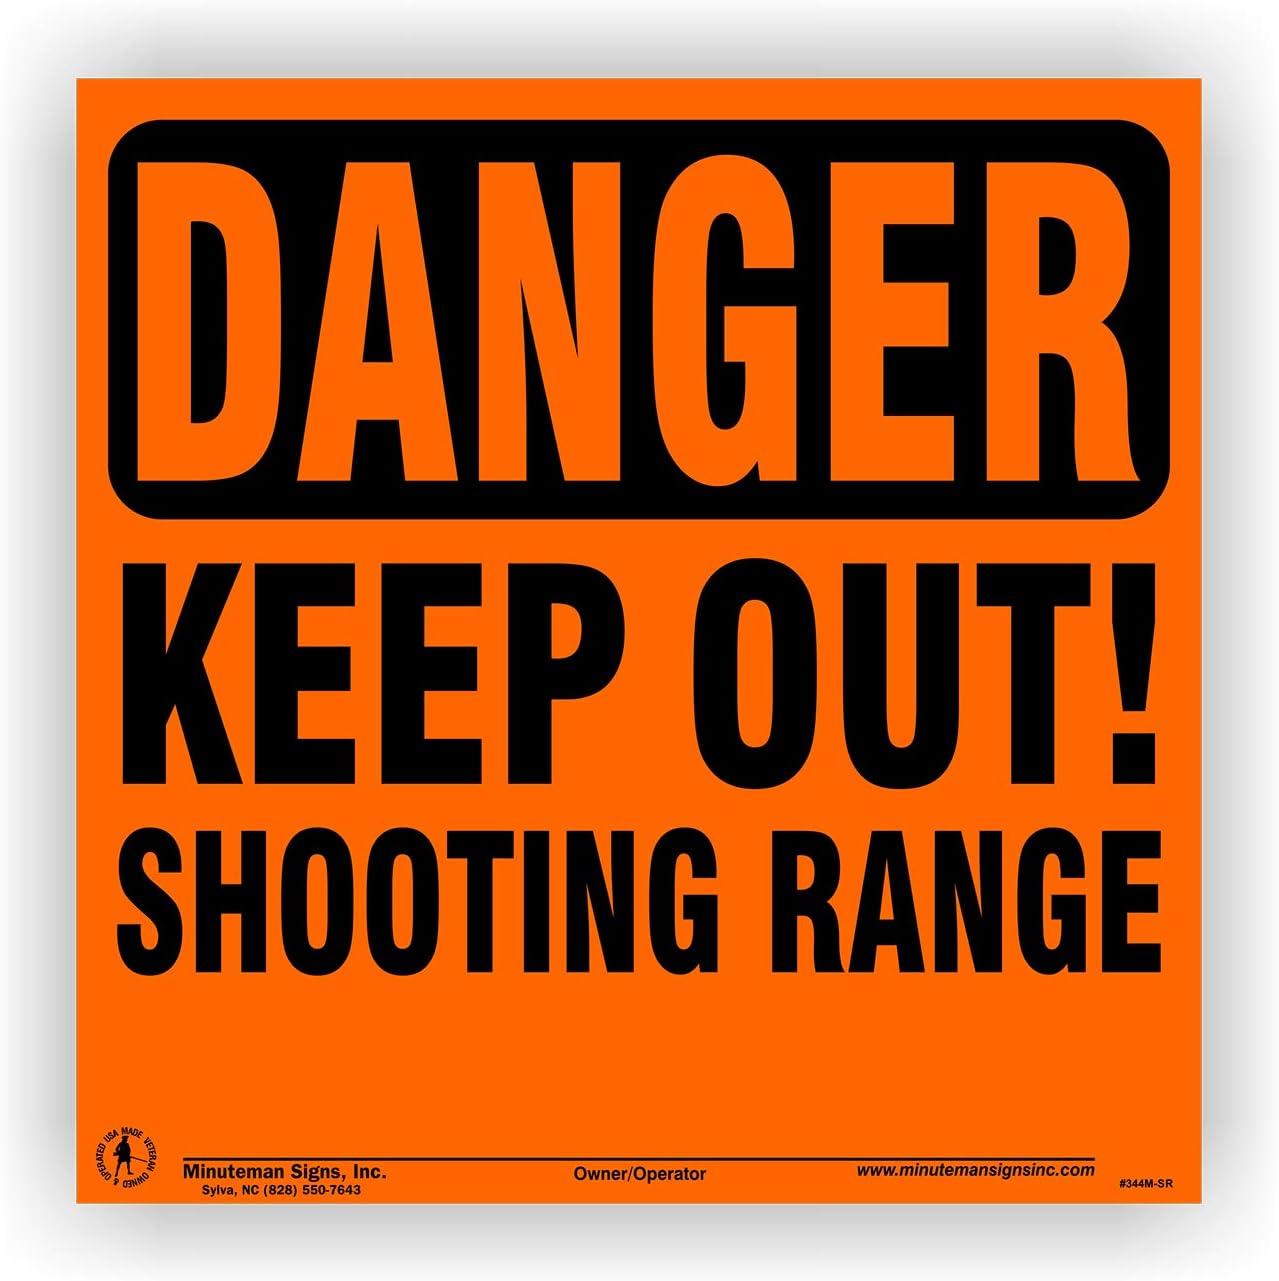 Minuteman Signs | Aluminum Danger Keep Out Shooting Range Sign 4 Pack (Orange)